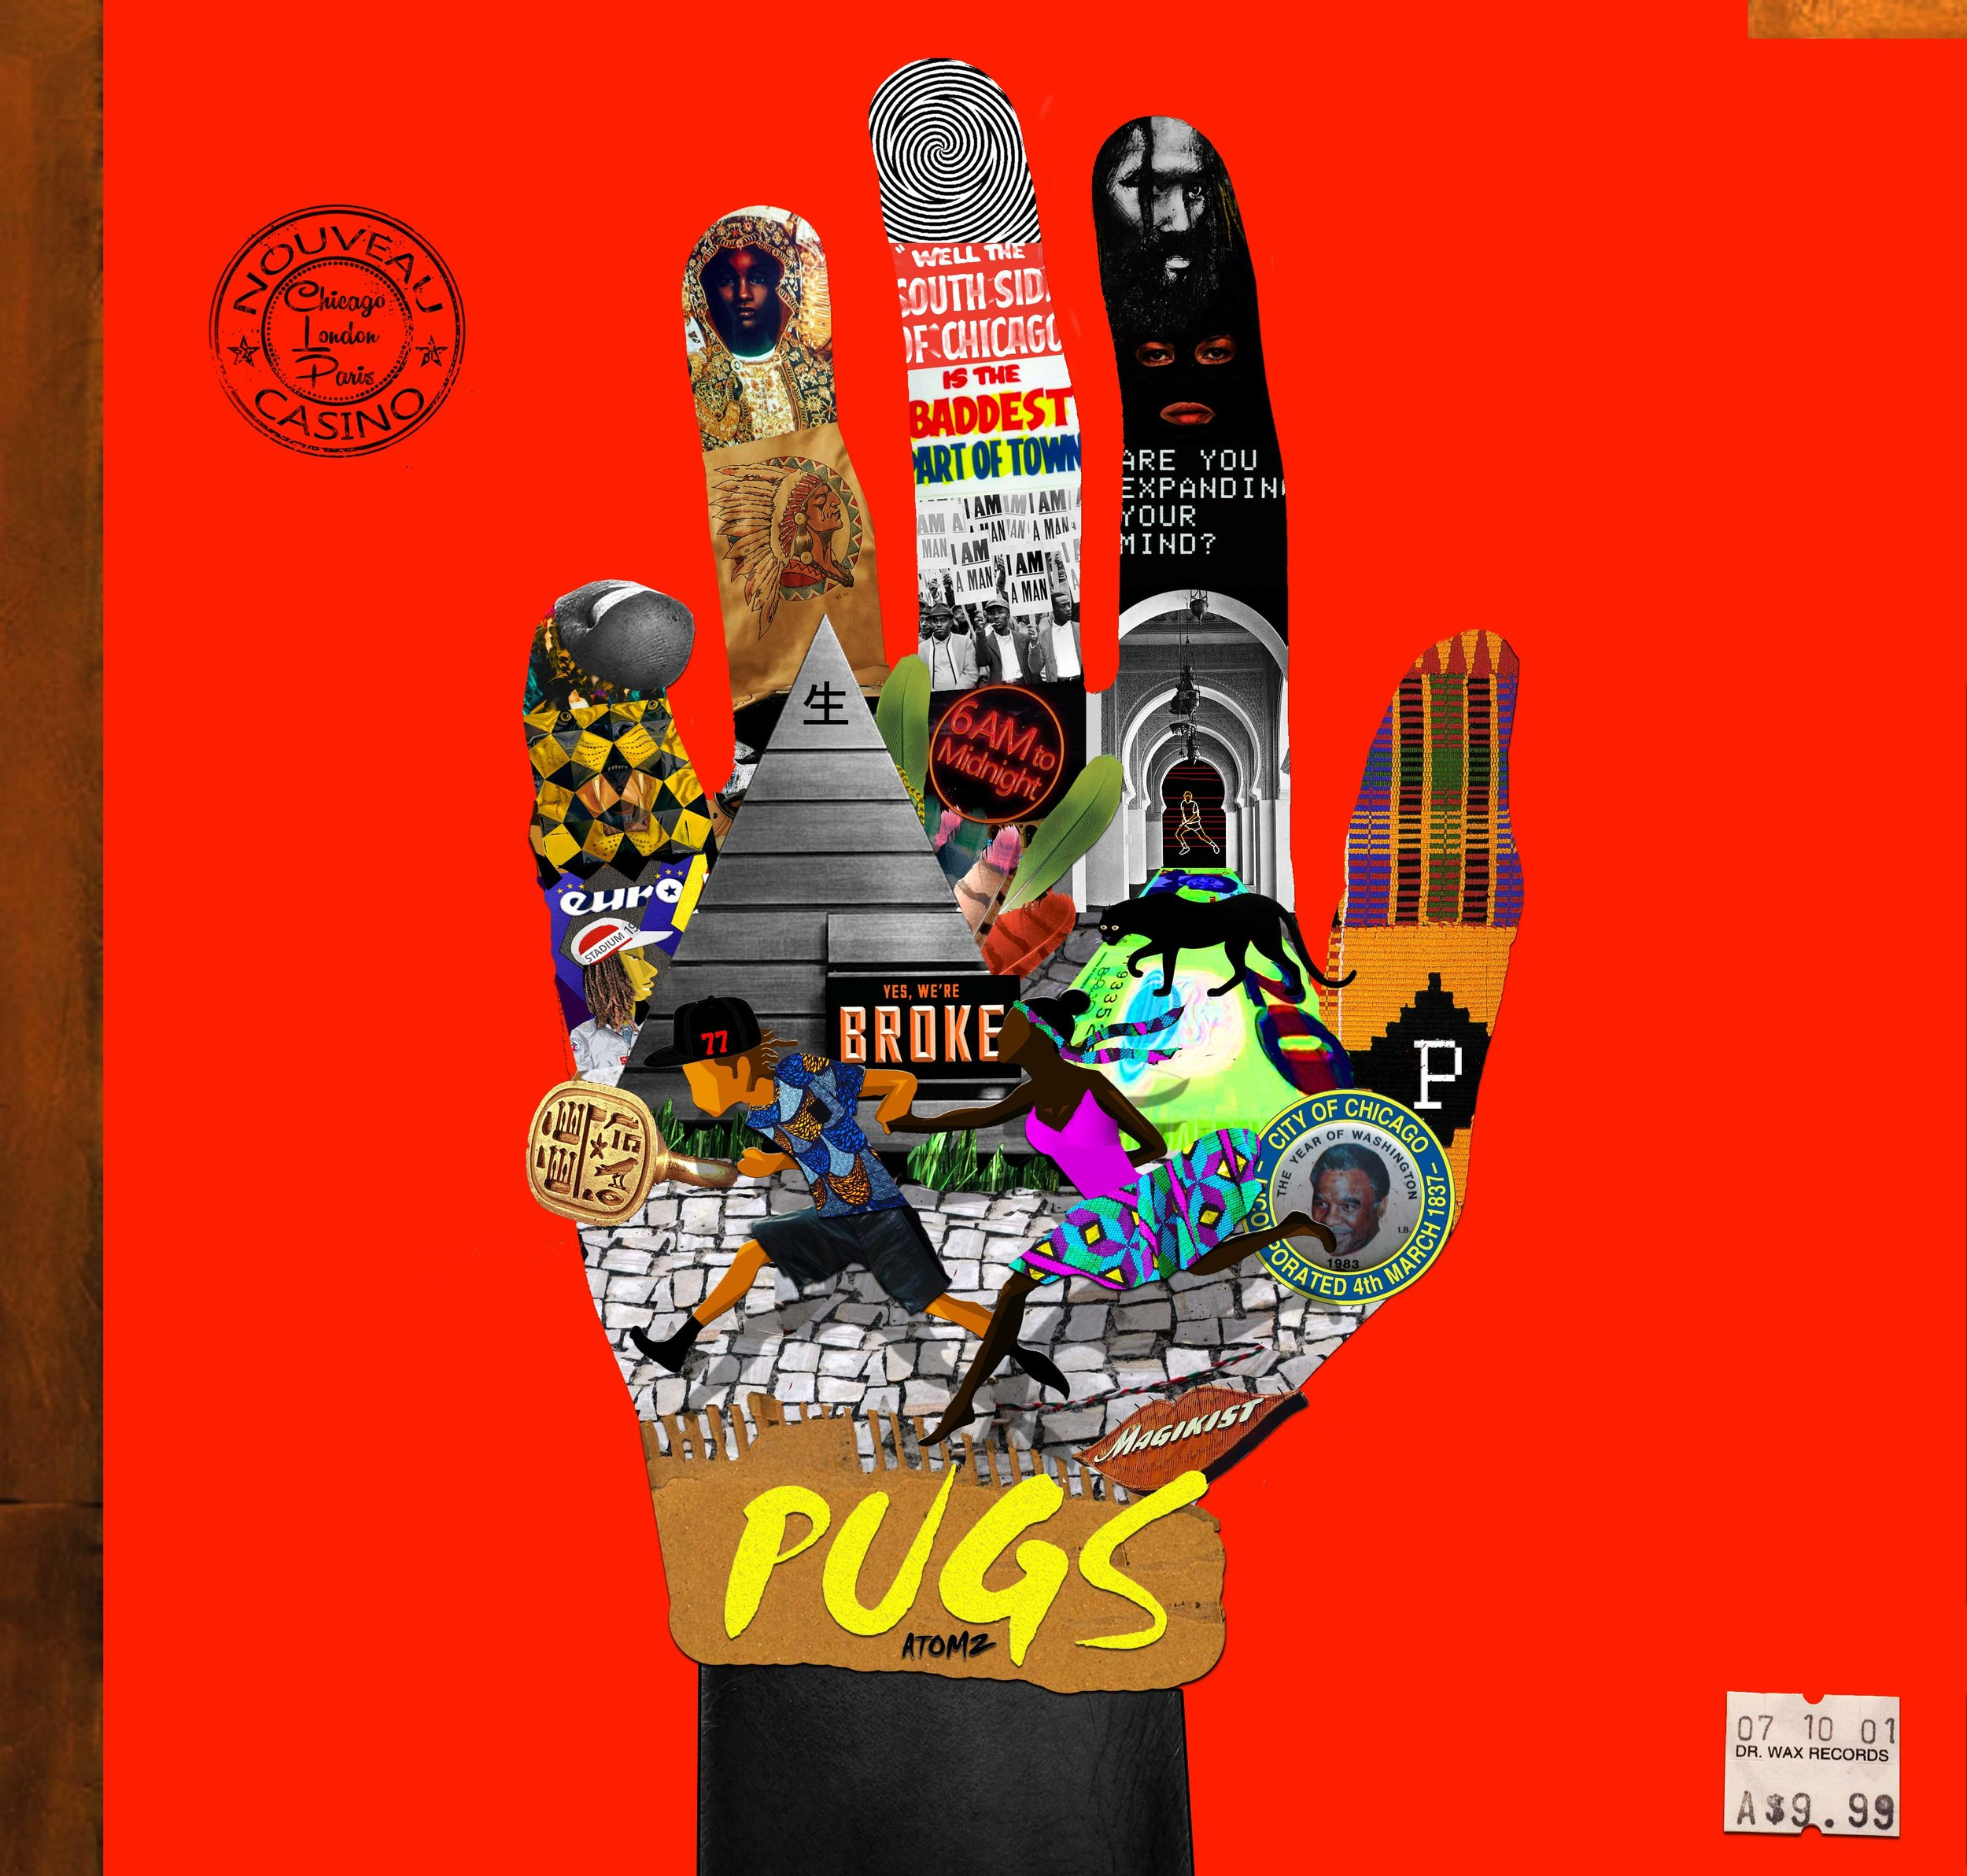 Nouveau-Casino-EP-Pugs-Atomz.jpg